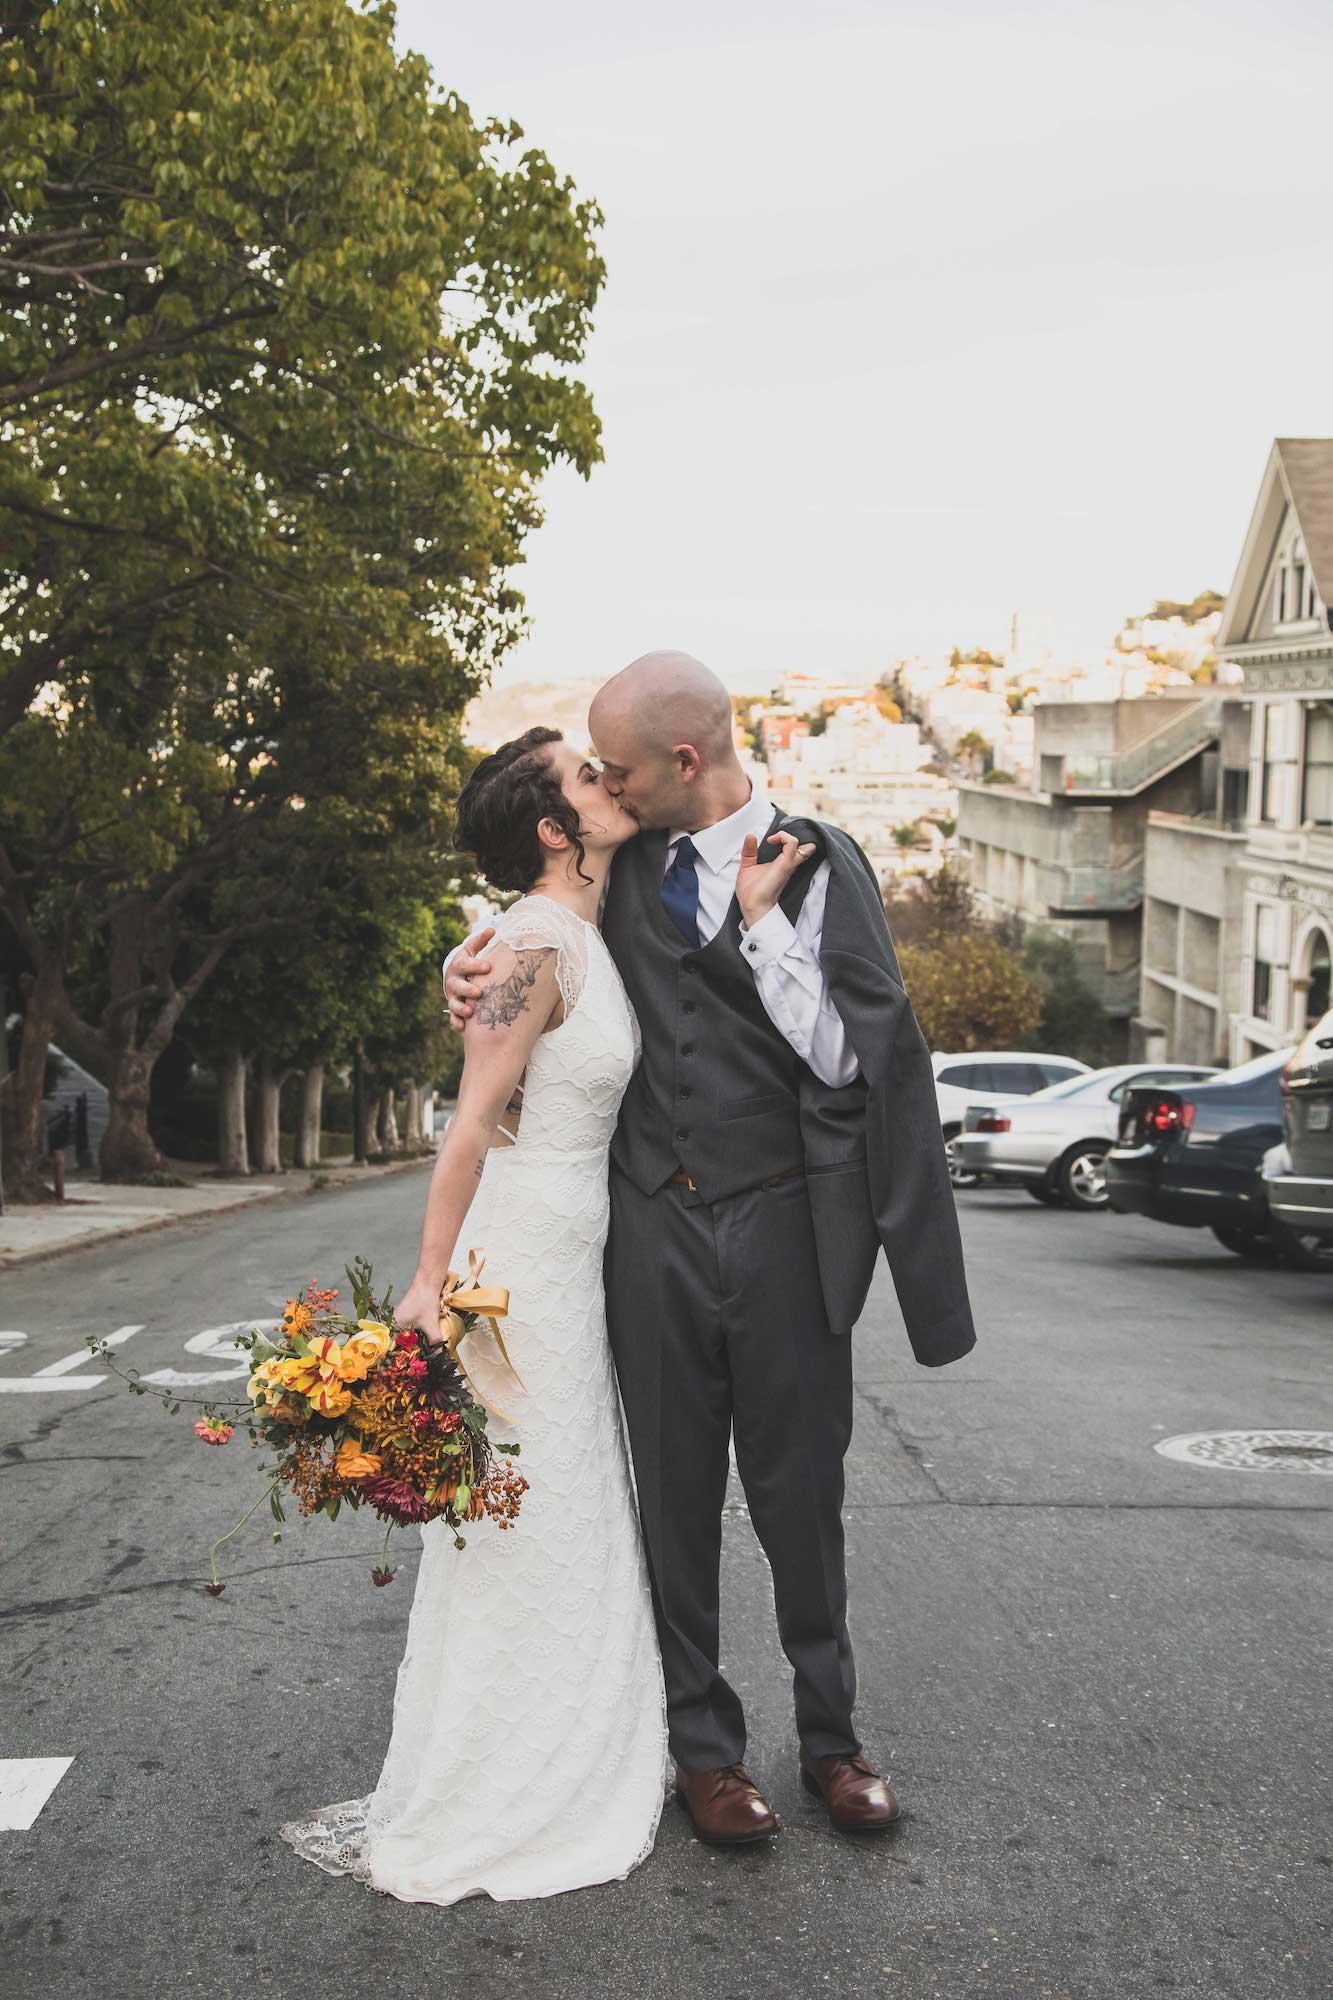 JakeDurrett_Wedding_Photography_001.jpg